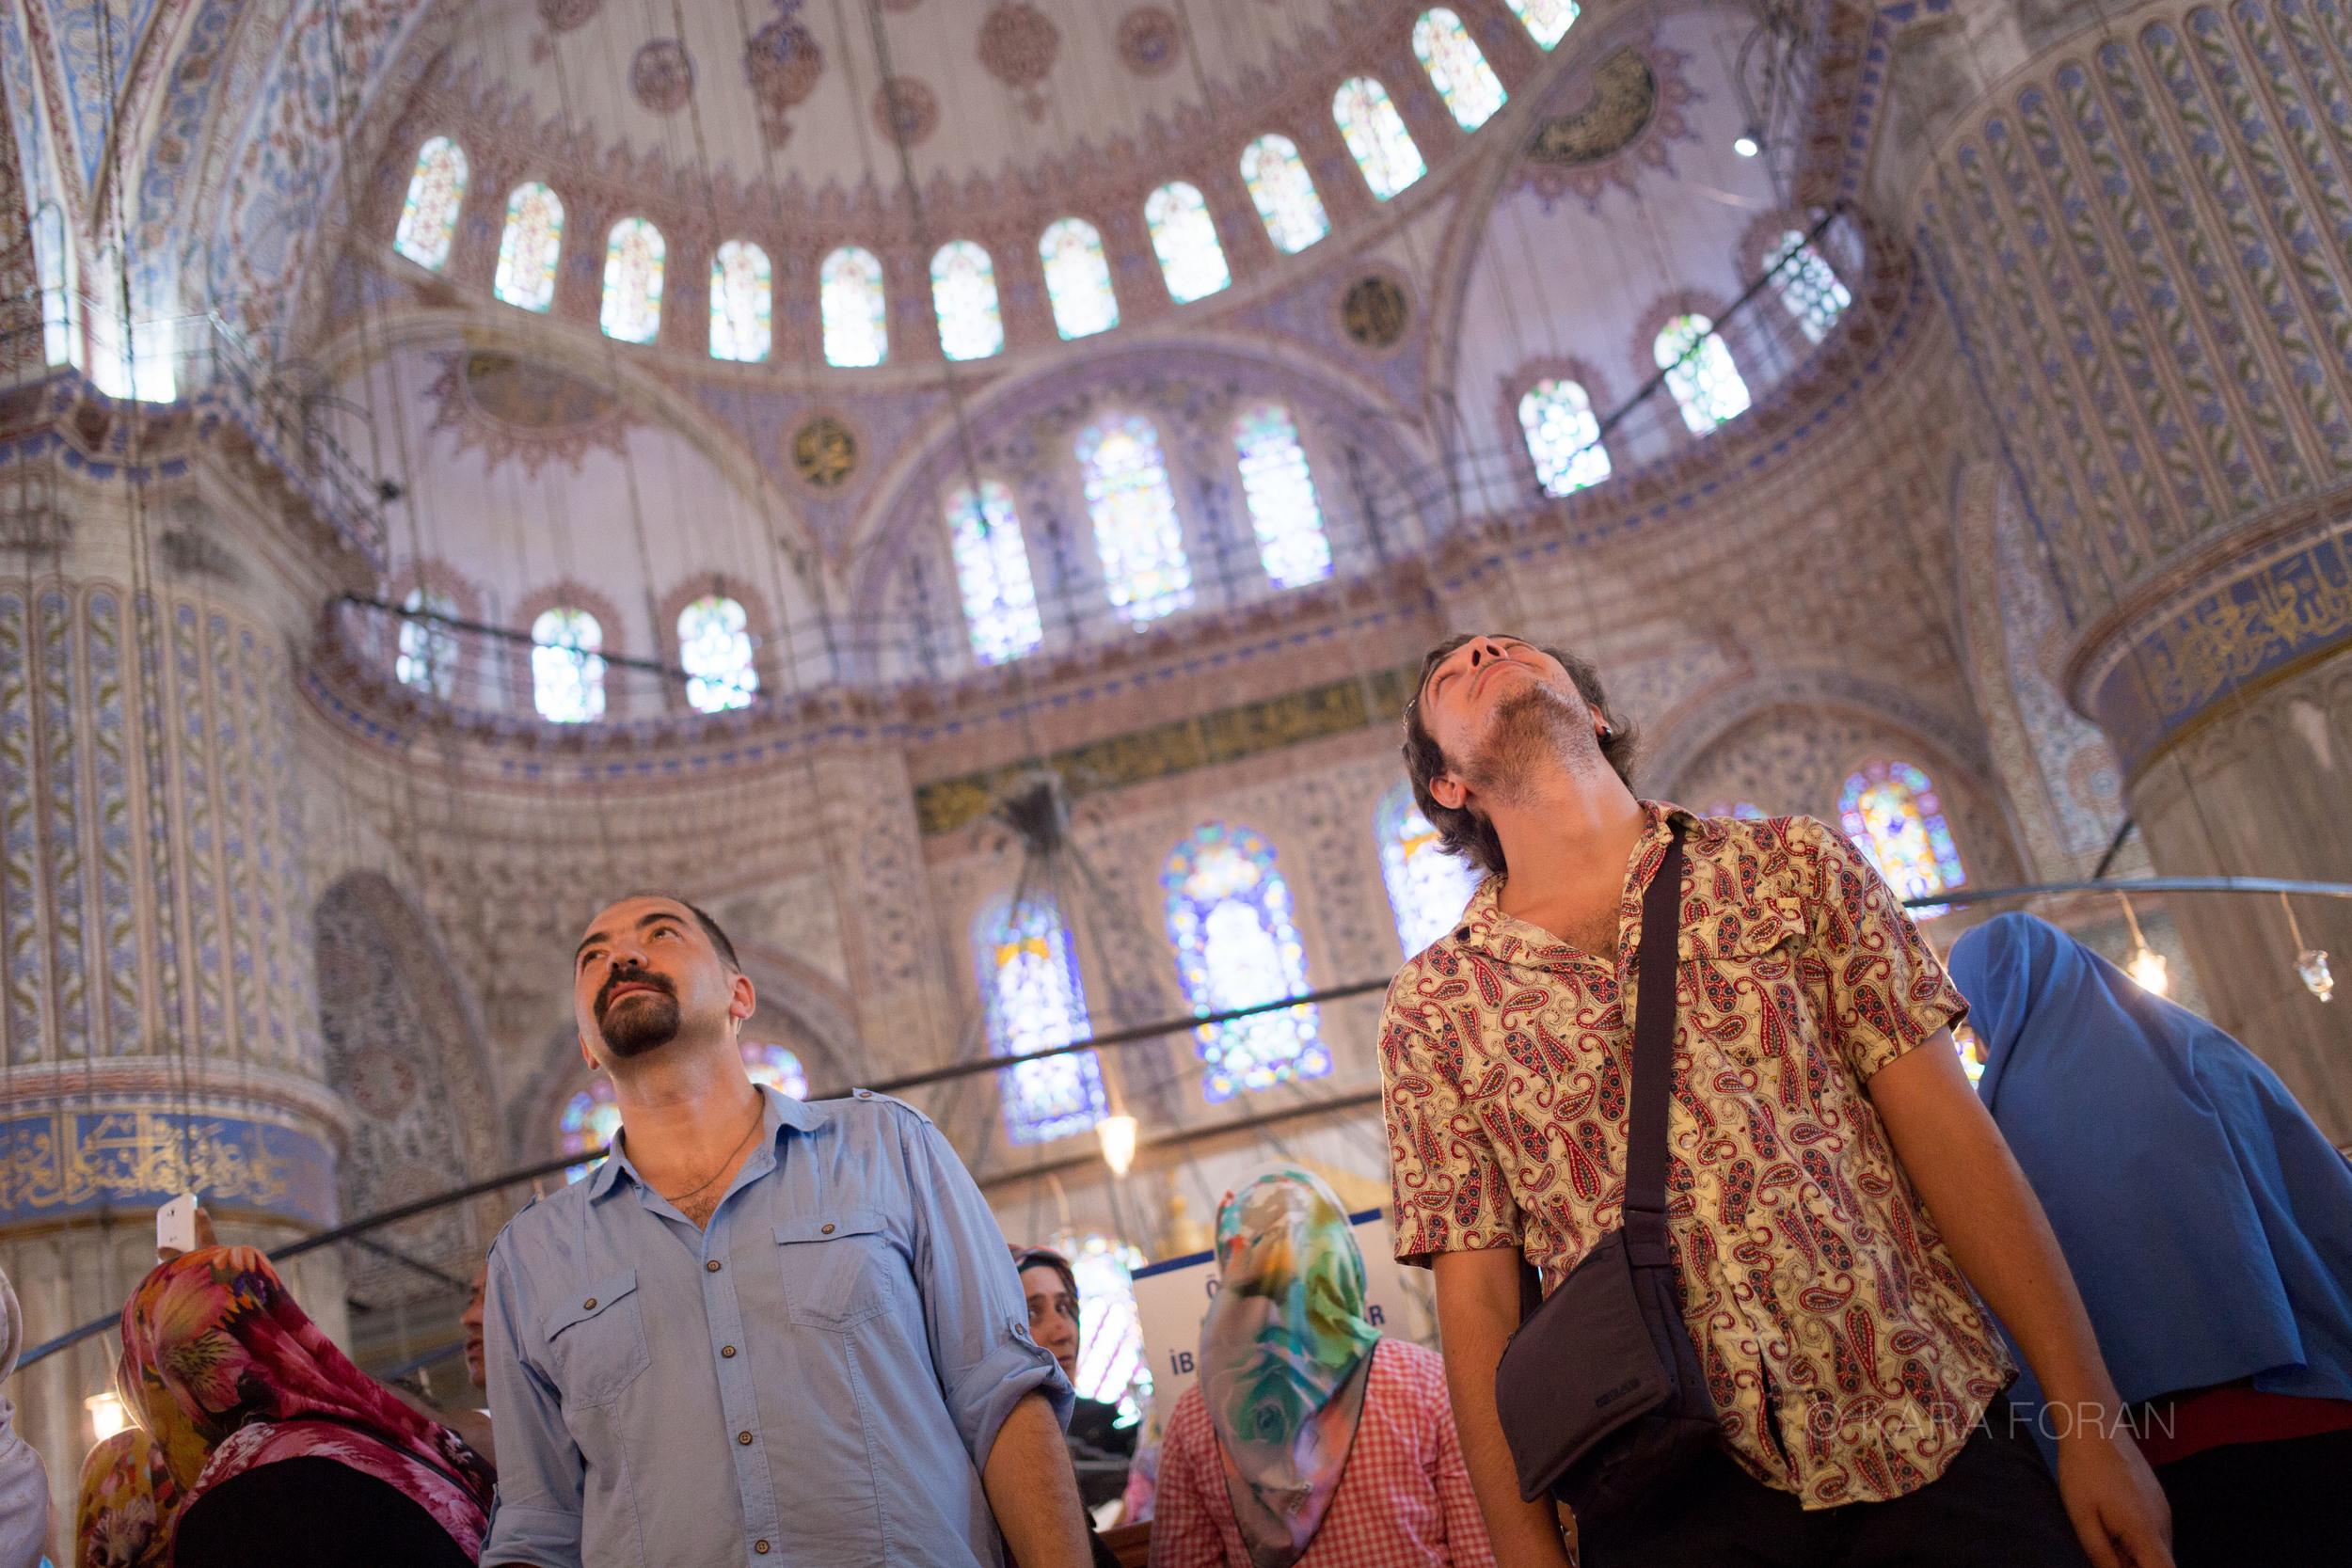 IstanbulCenter_005_03.jpg